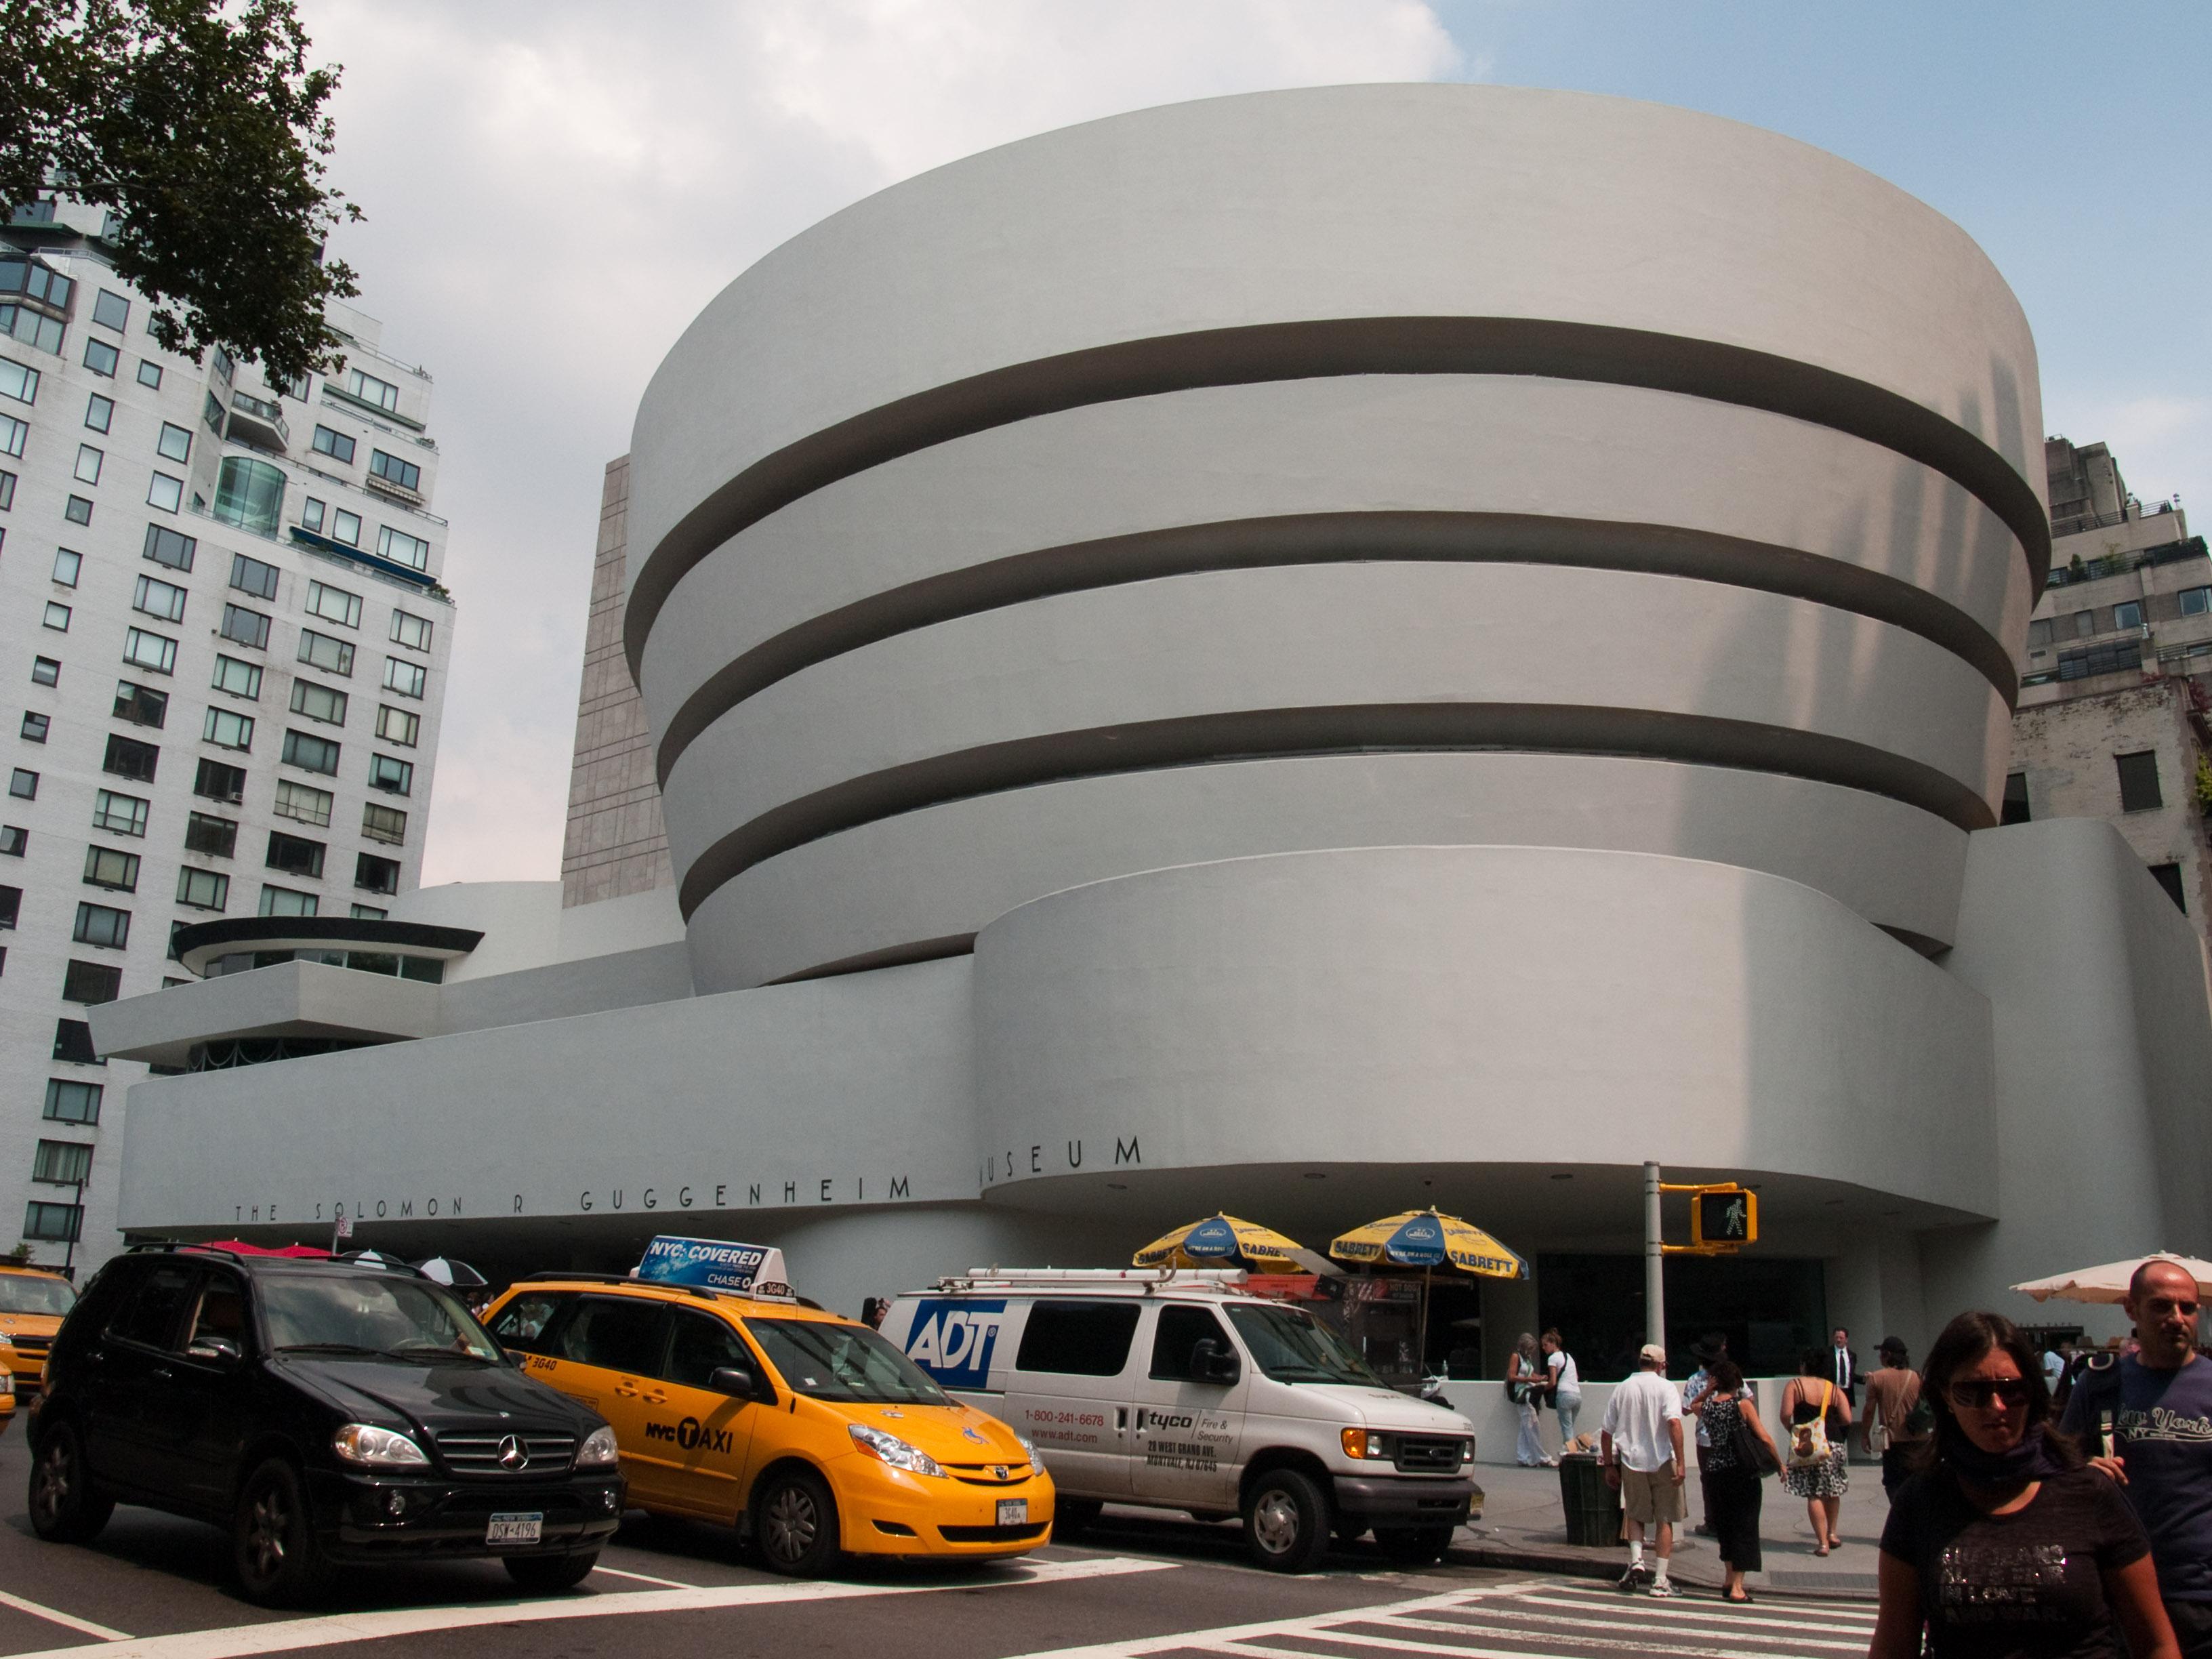 Archikey.com  Buildings  Solomon R. Guggenheim Museum